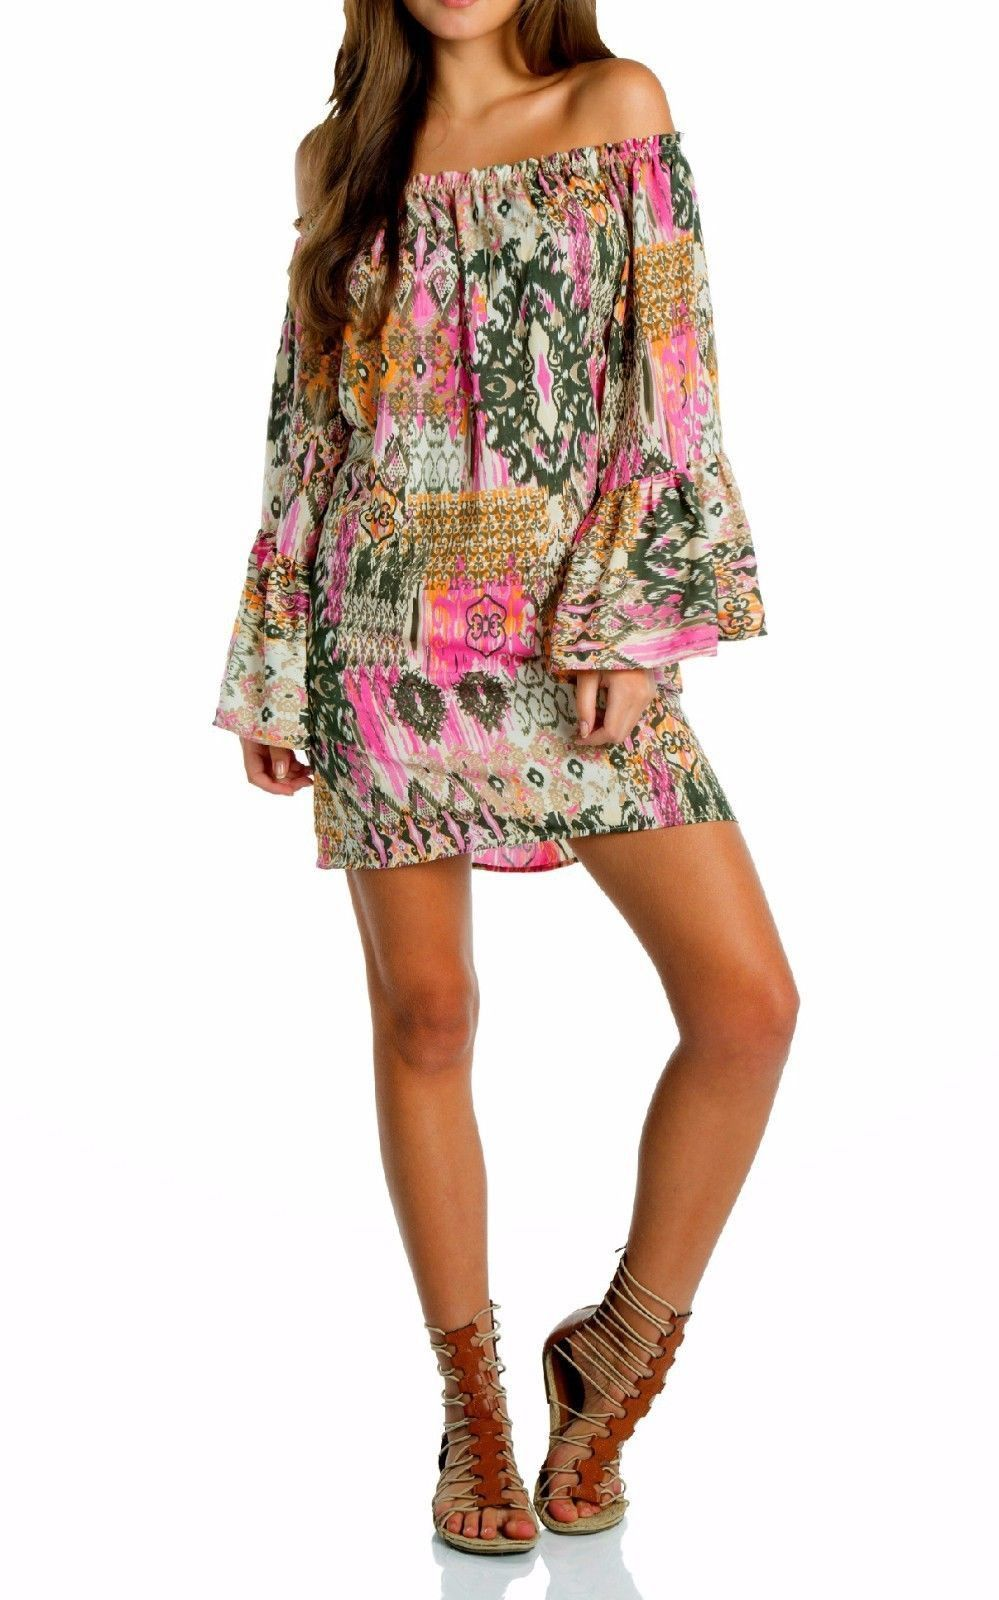 Boho tunic top blouses and dress 4009 trendy boho vintage gypsy - Eliza Bella For Elan Boho Hippie Off Shoulder Dress Blouse 3 Colors Sml